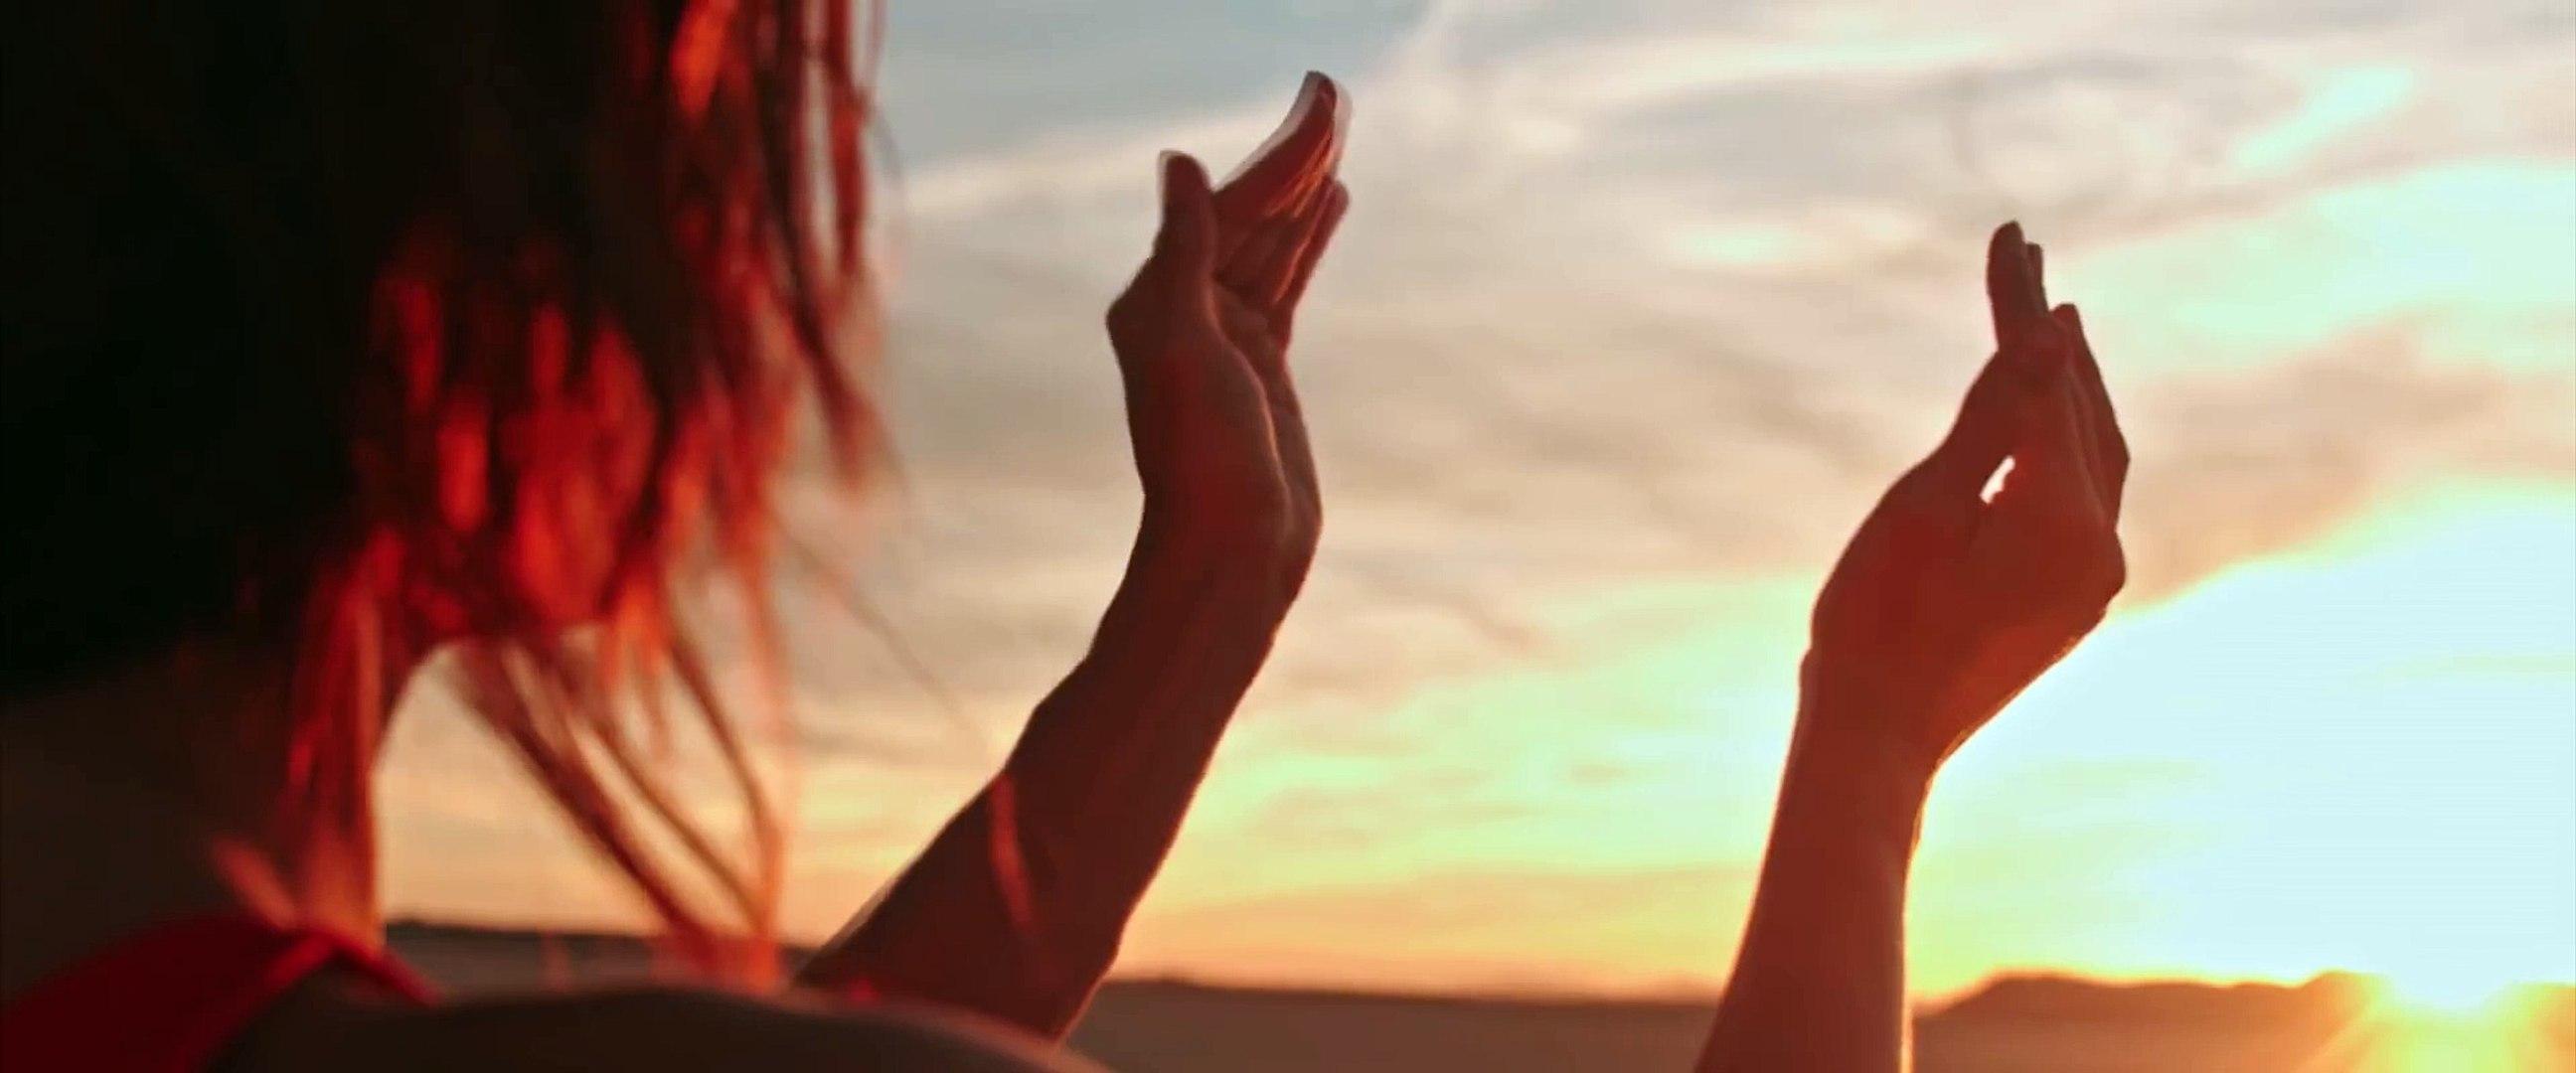 pensieri su in arrivo colore n brillante Akcent feat. REEA - Stole My Heart (Official Video